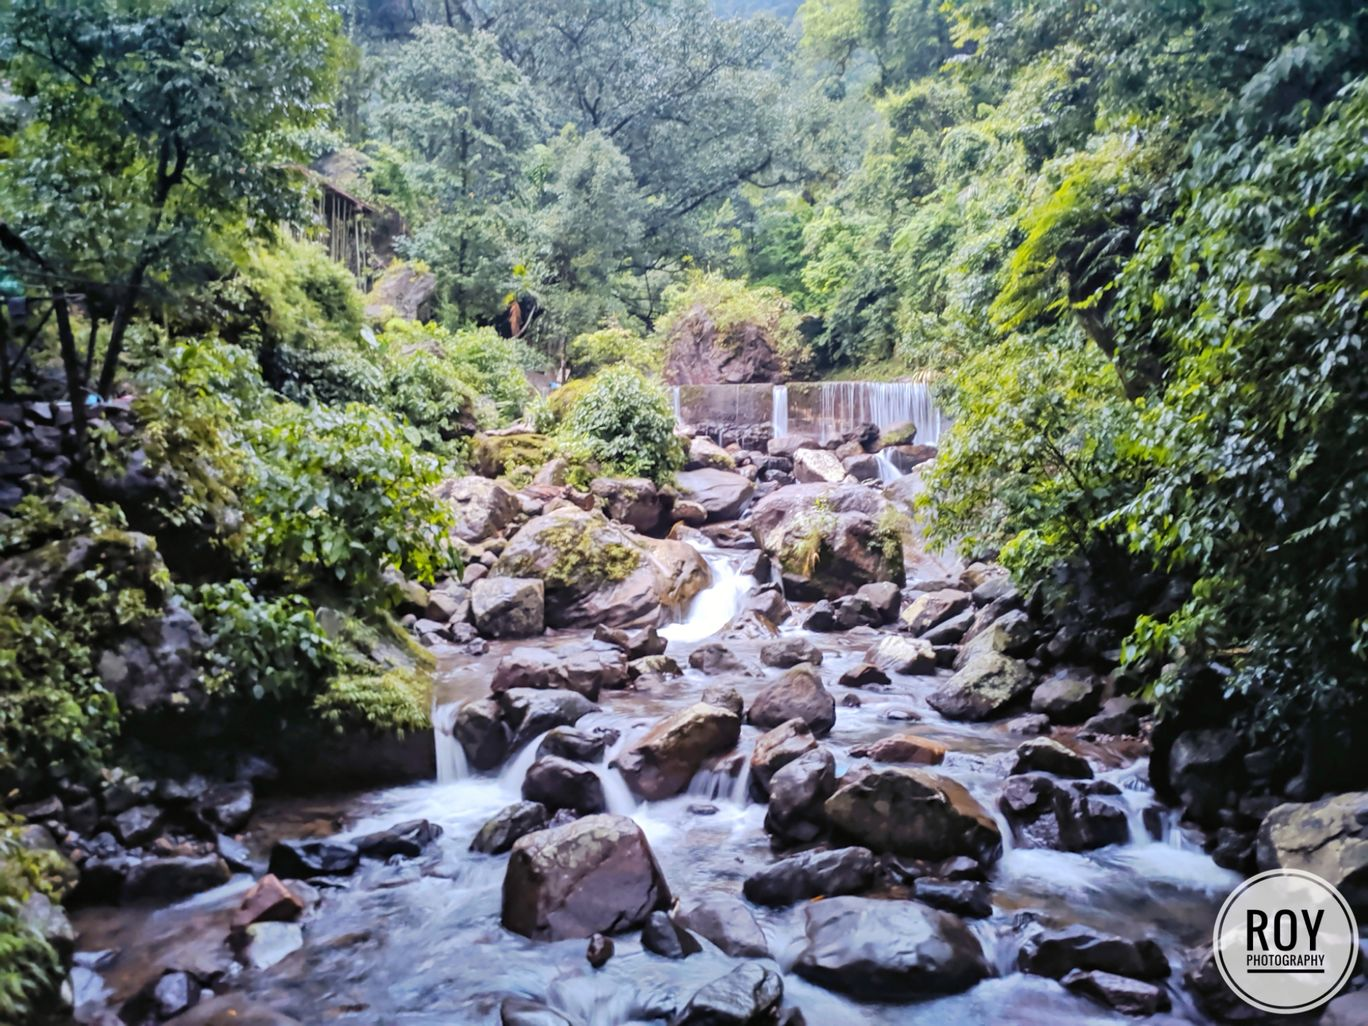 Photo of Meghalaya By Baishayan Roy